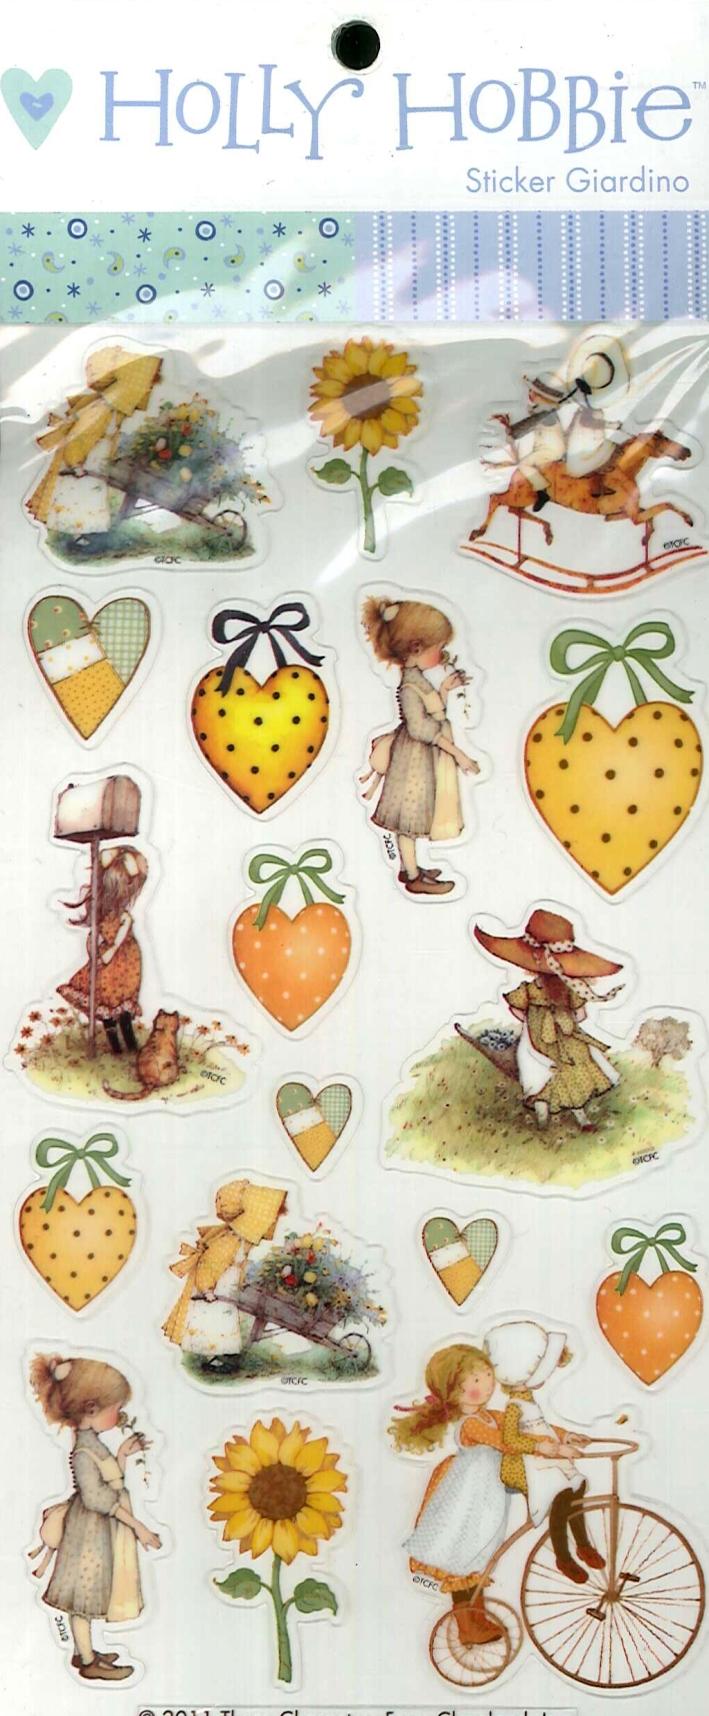 Holly Hobbie. Giardino. Sticker